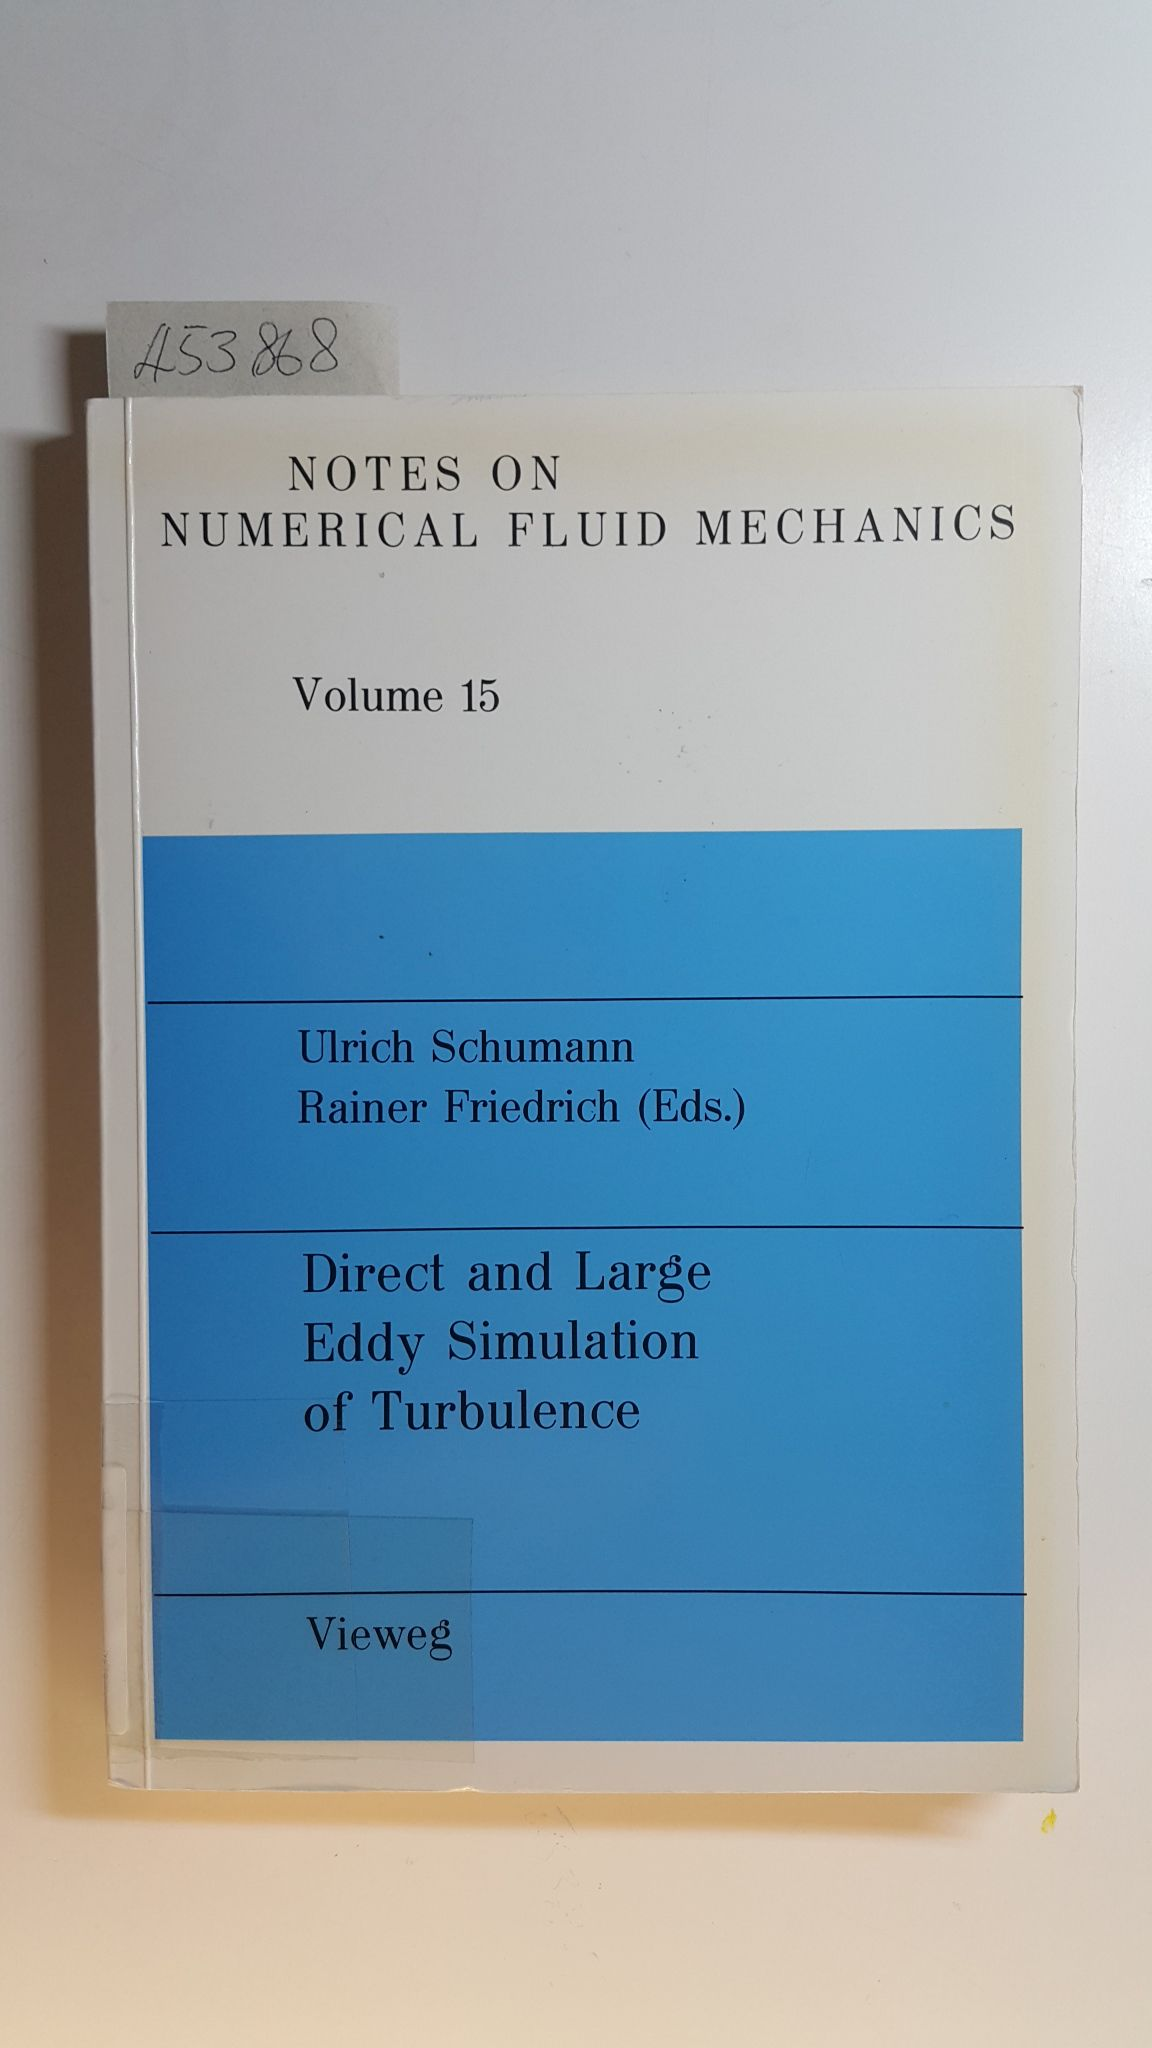 Direct and Large Eddy Simulation of TurbulenceProceedings: Ulrich Schumann ;